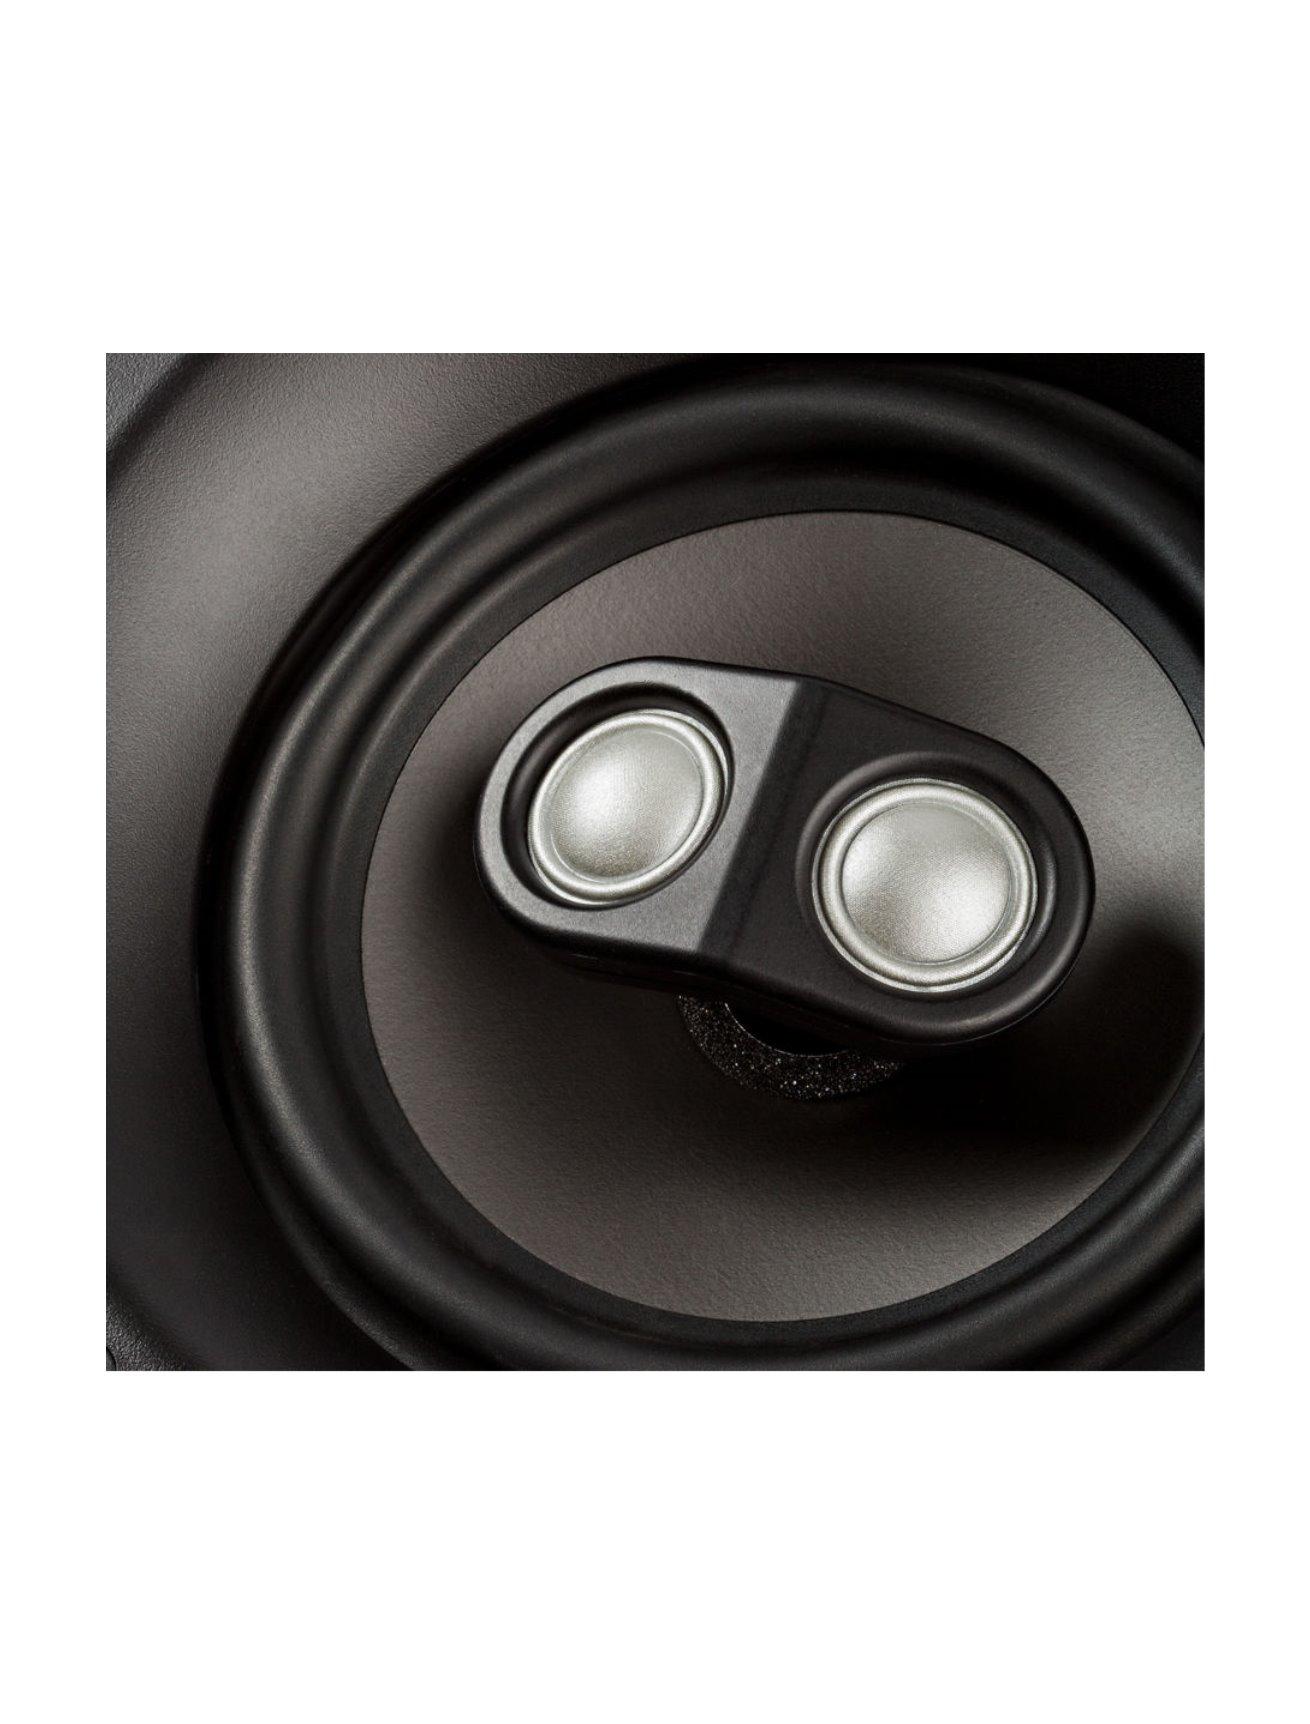 Polk Audio V6S Χωνευτό Στερεοφωνικό Ηχείο 6.5″ 8Ω 100W